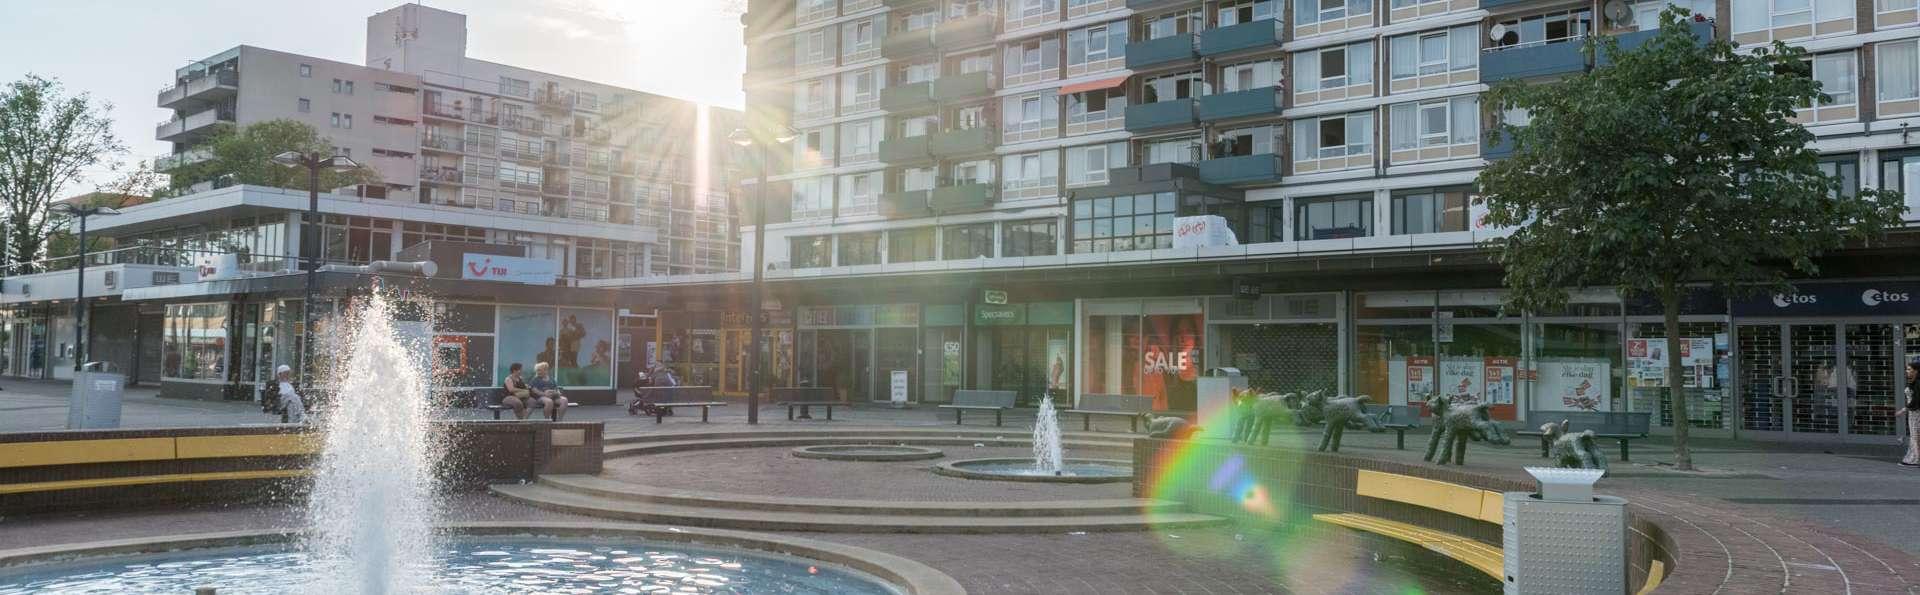 Citiez Hotel Amsterdam - EDIT_FRONT_02.jpg